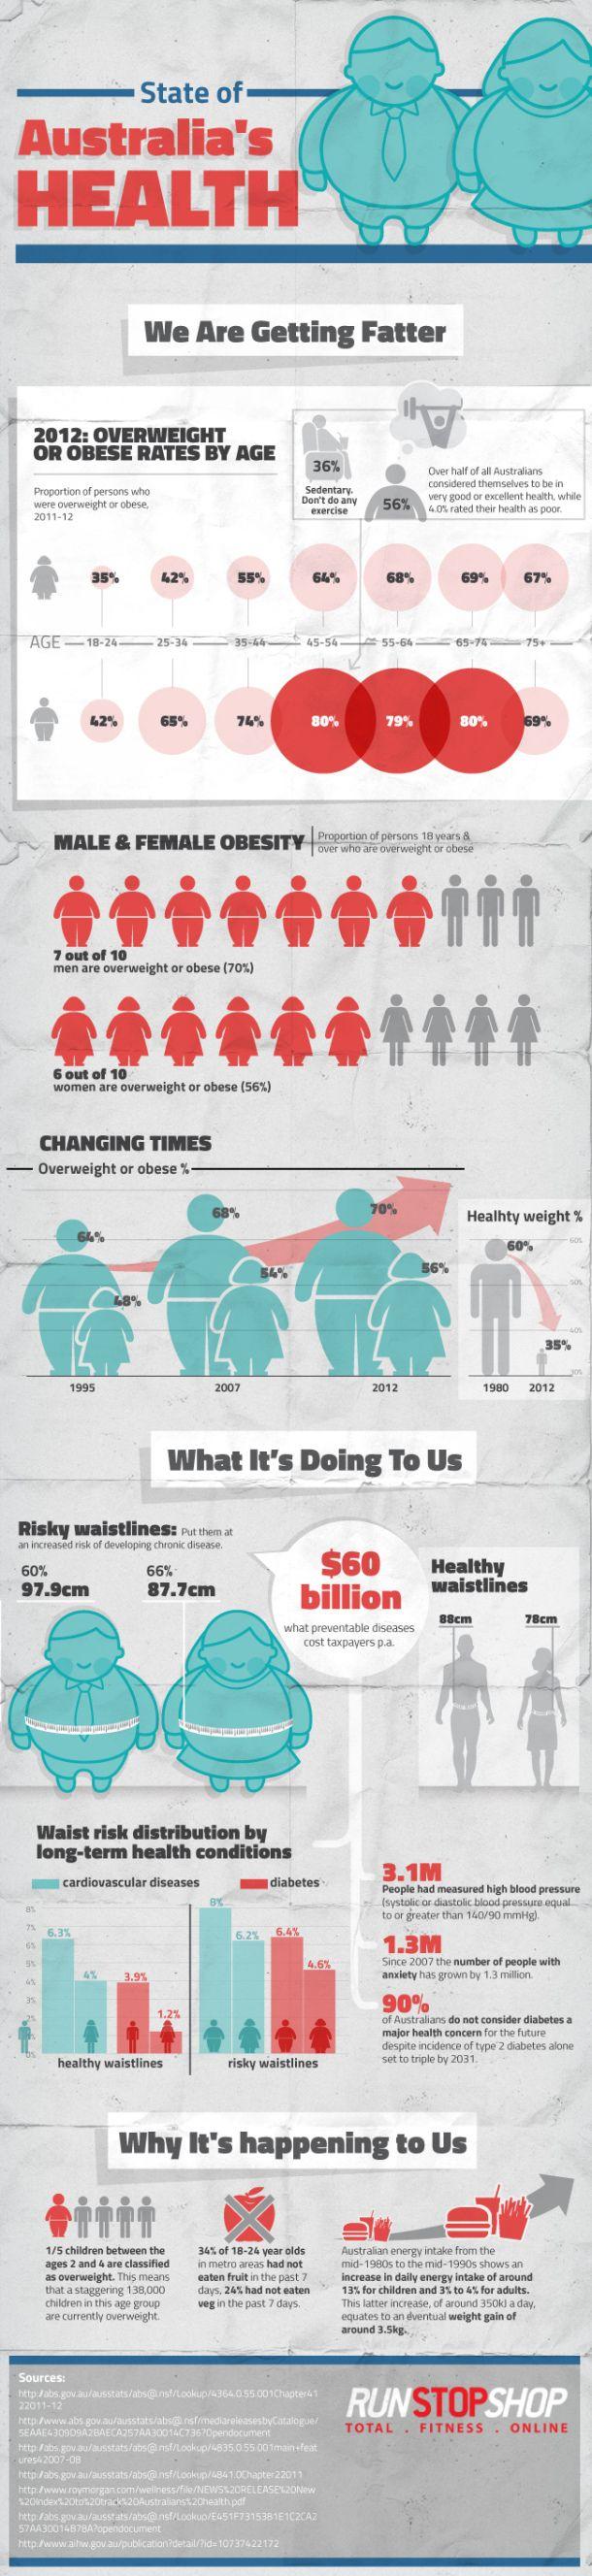 State of Australia's Health [INFOGRAPHIC]